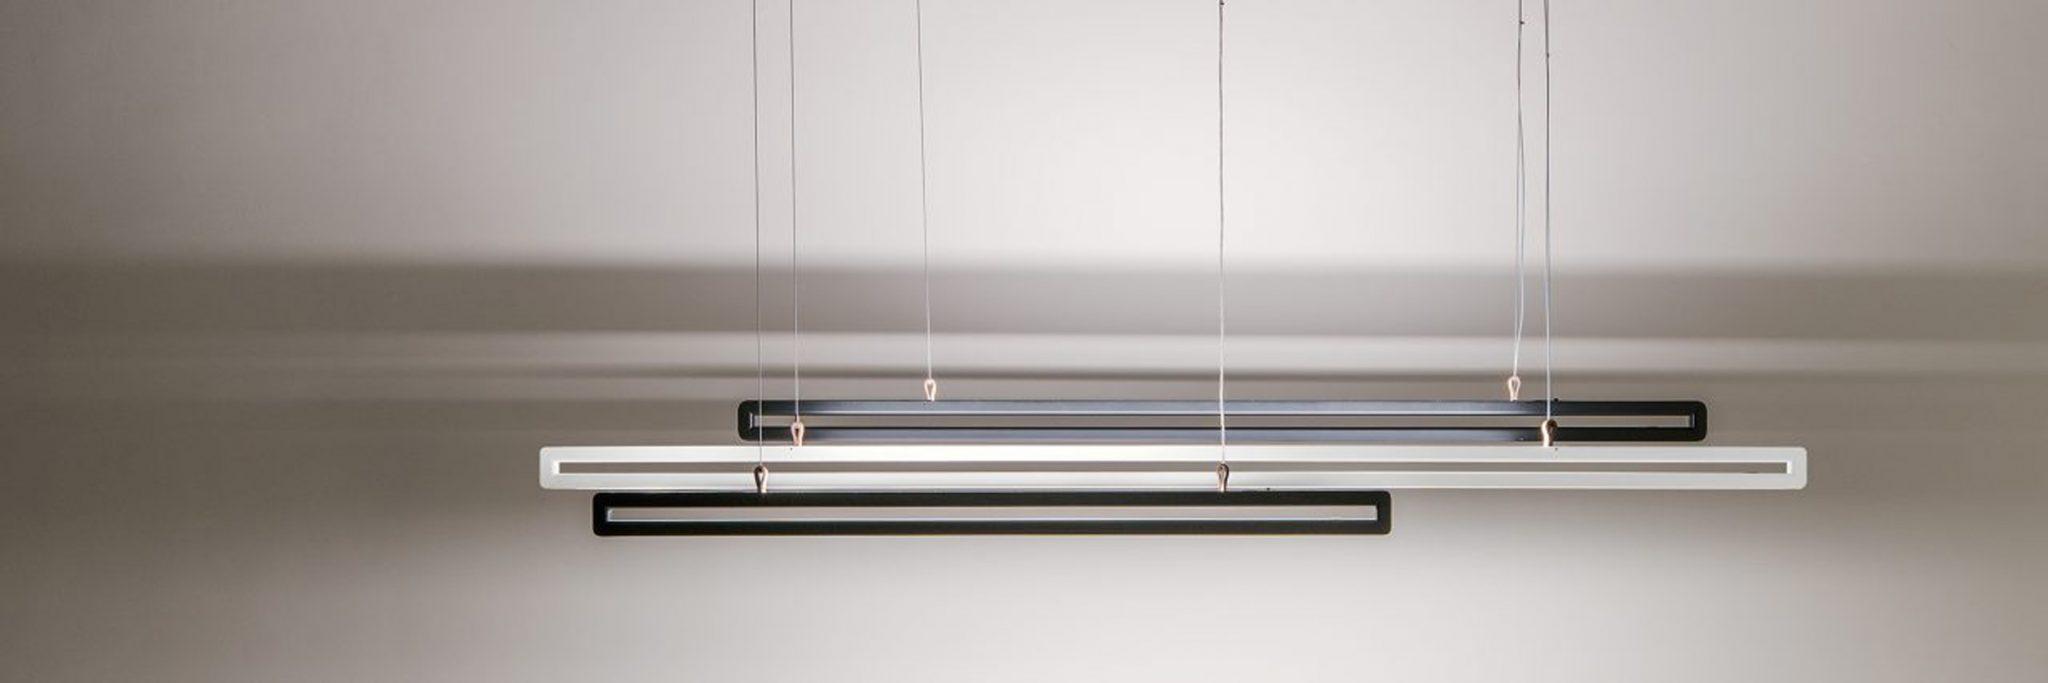 jacco-maris-framed-2500px